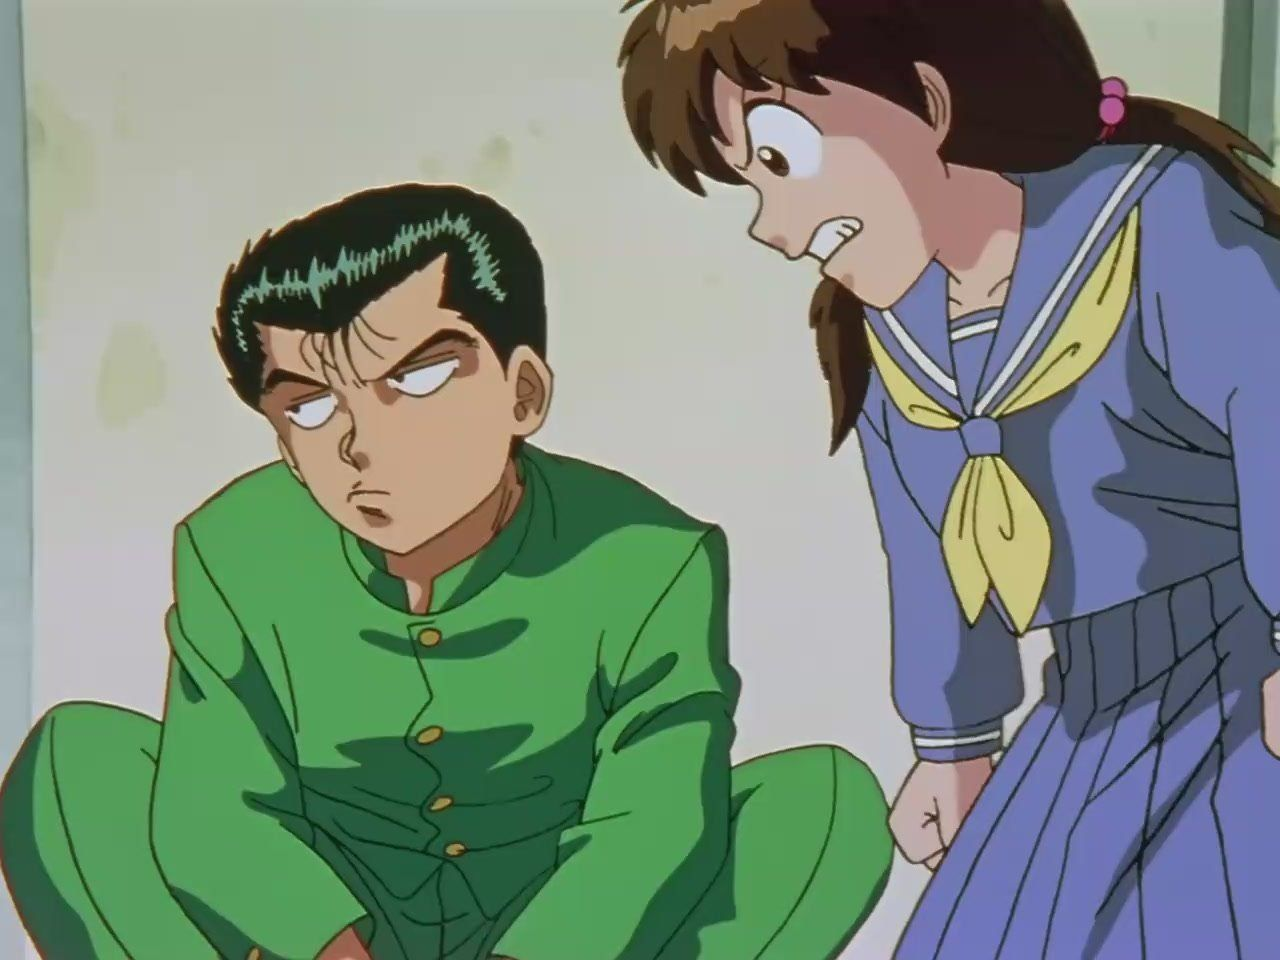 Yusuke urameshi mang s e animes pinterest yuyu for Yusuke demon